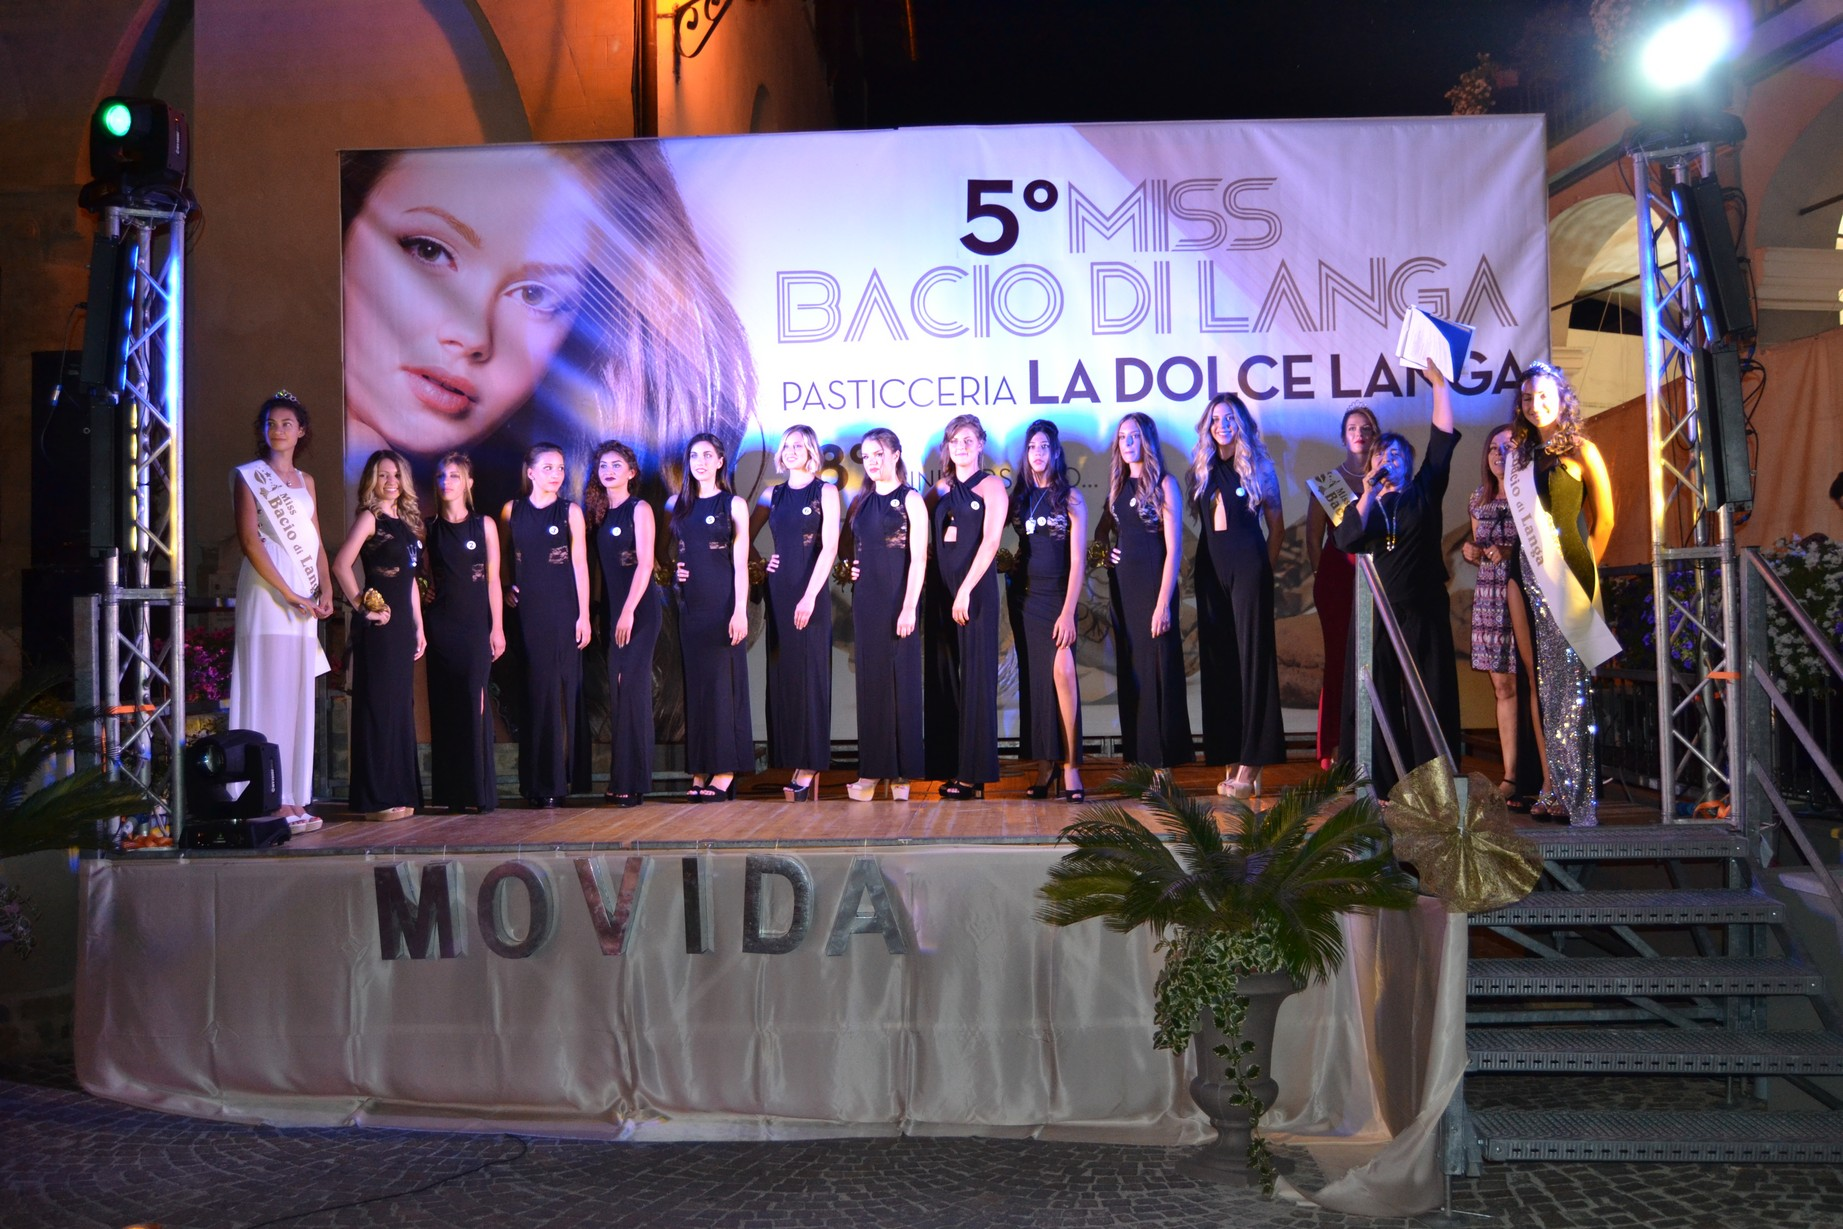 Ragazze sul palco di Miss Bacio di Langa 2017